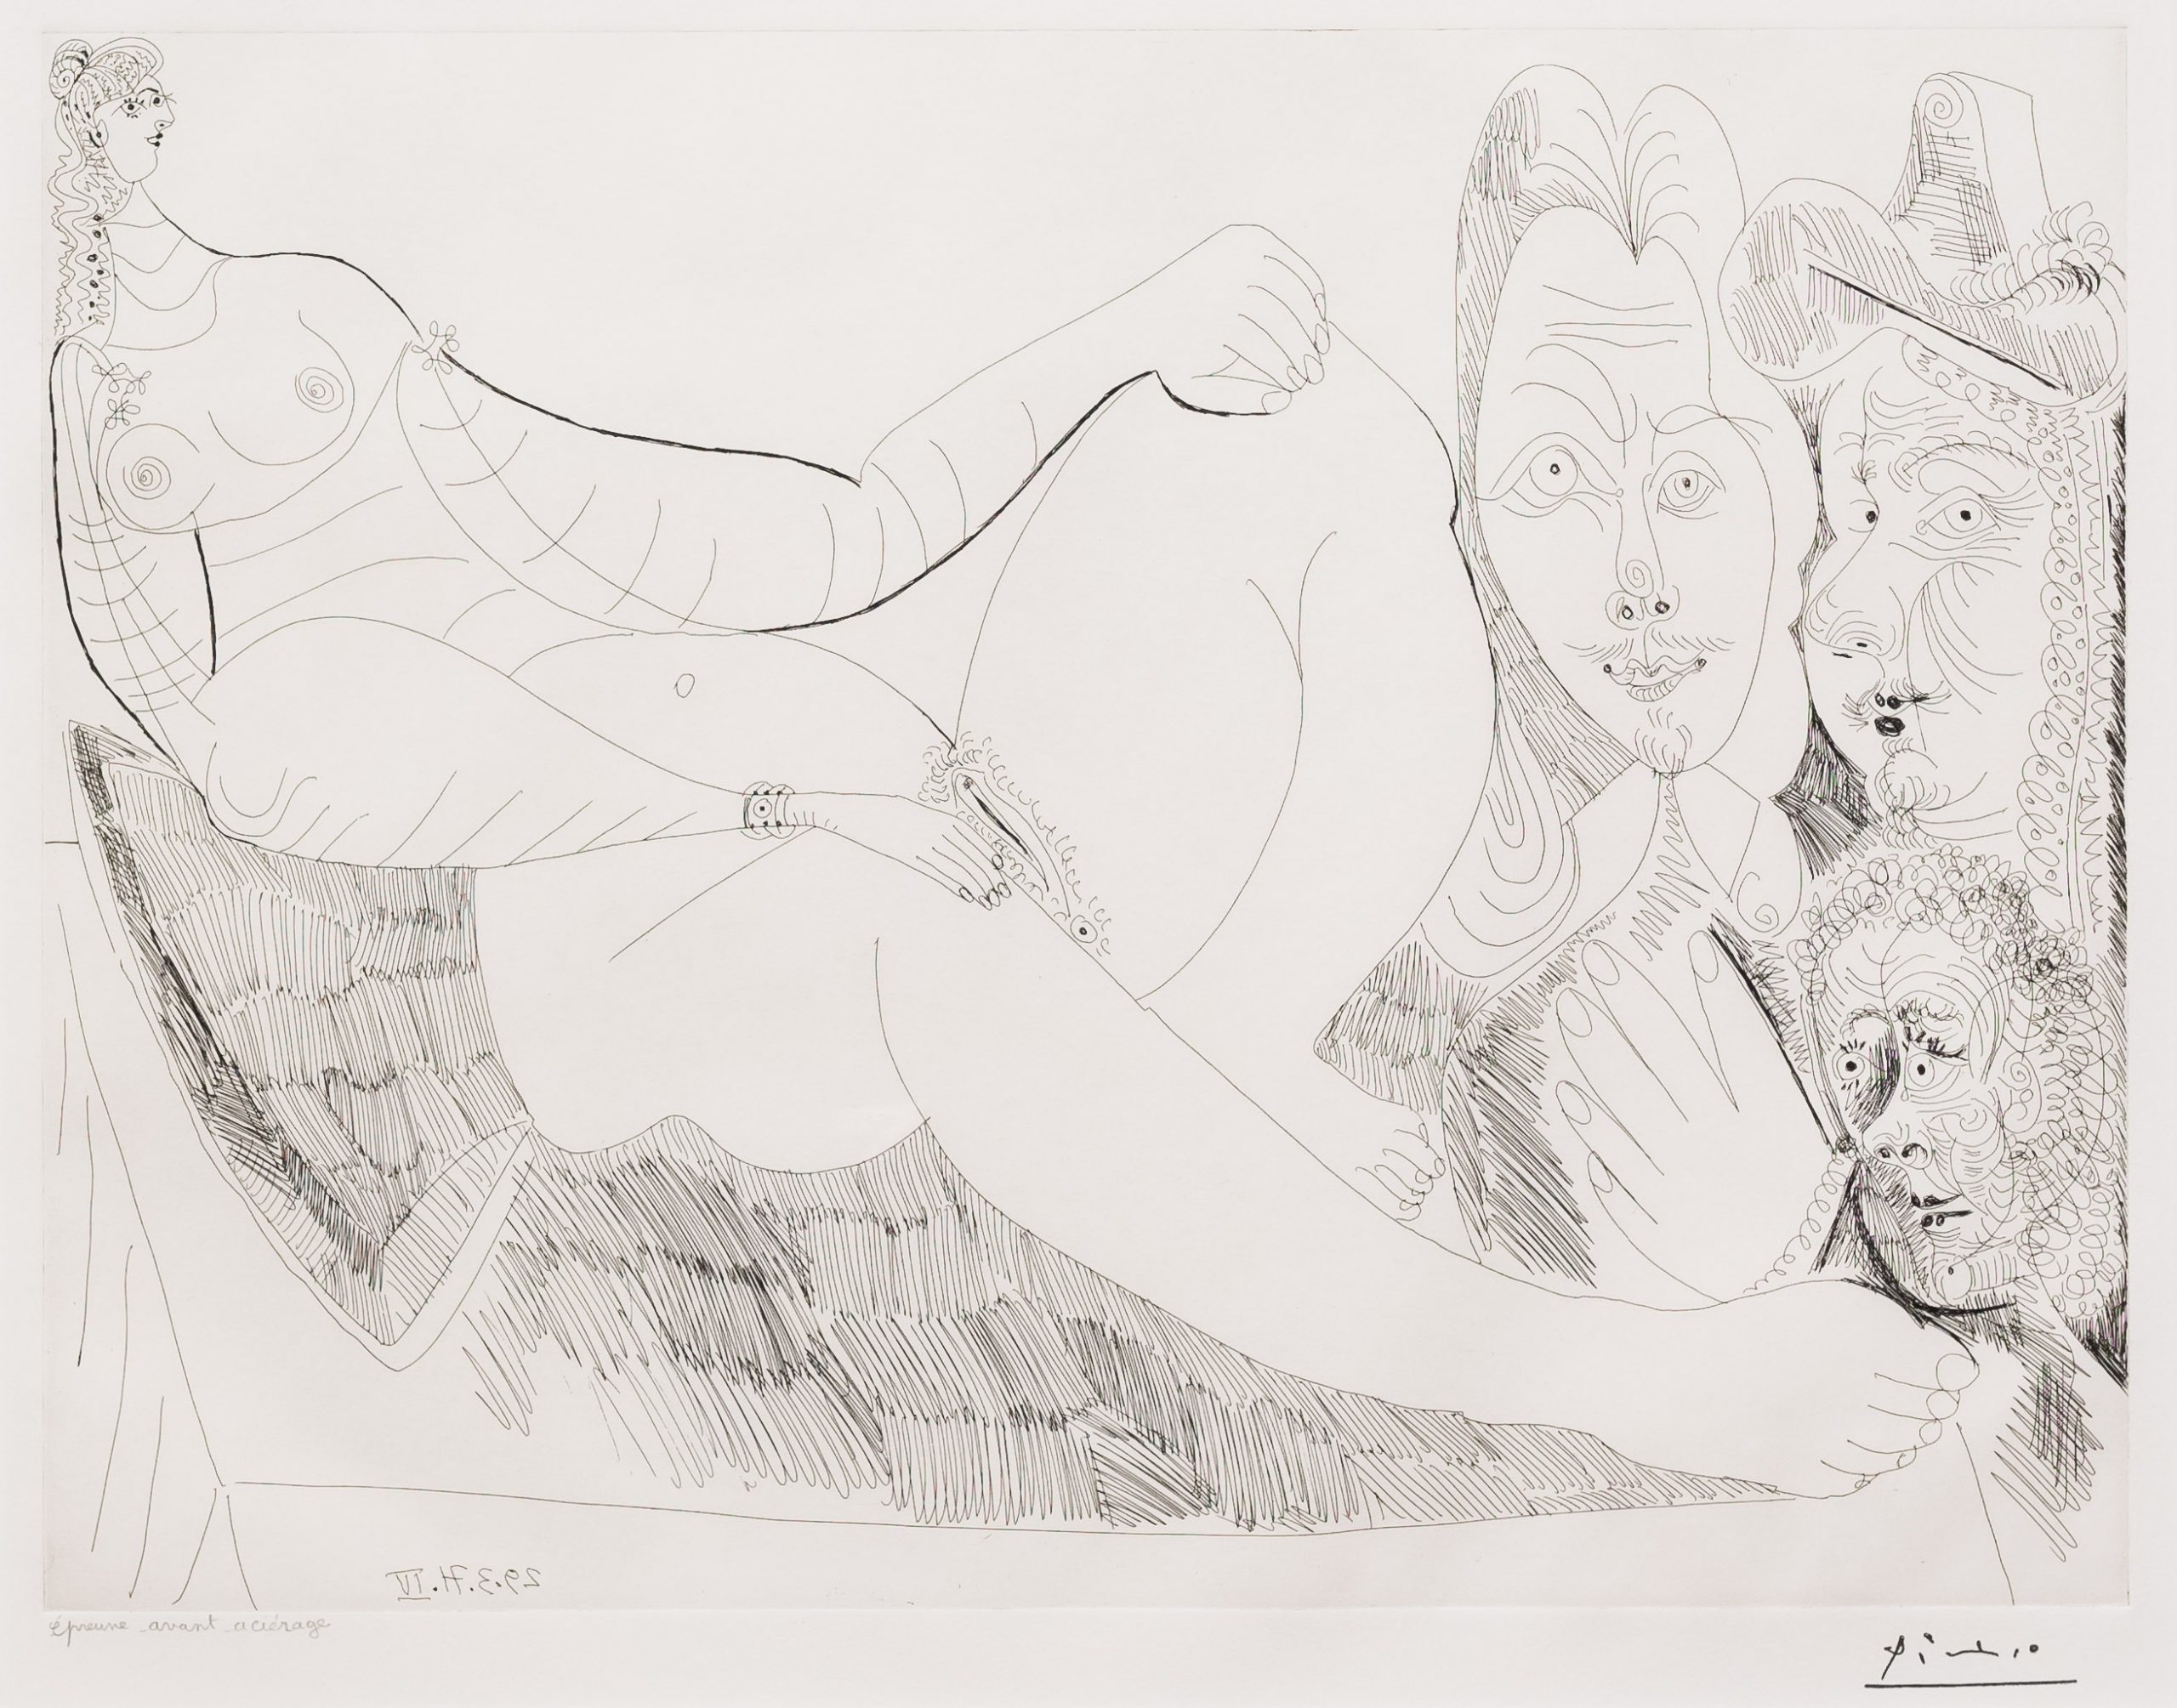 Femme au Lit avec Visiteurs…, from the 156 Series by Pablo Picasso